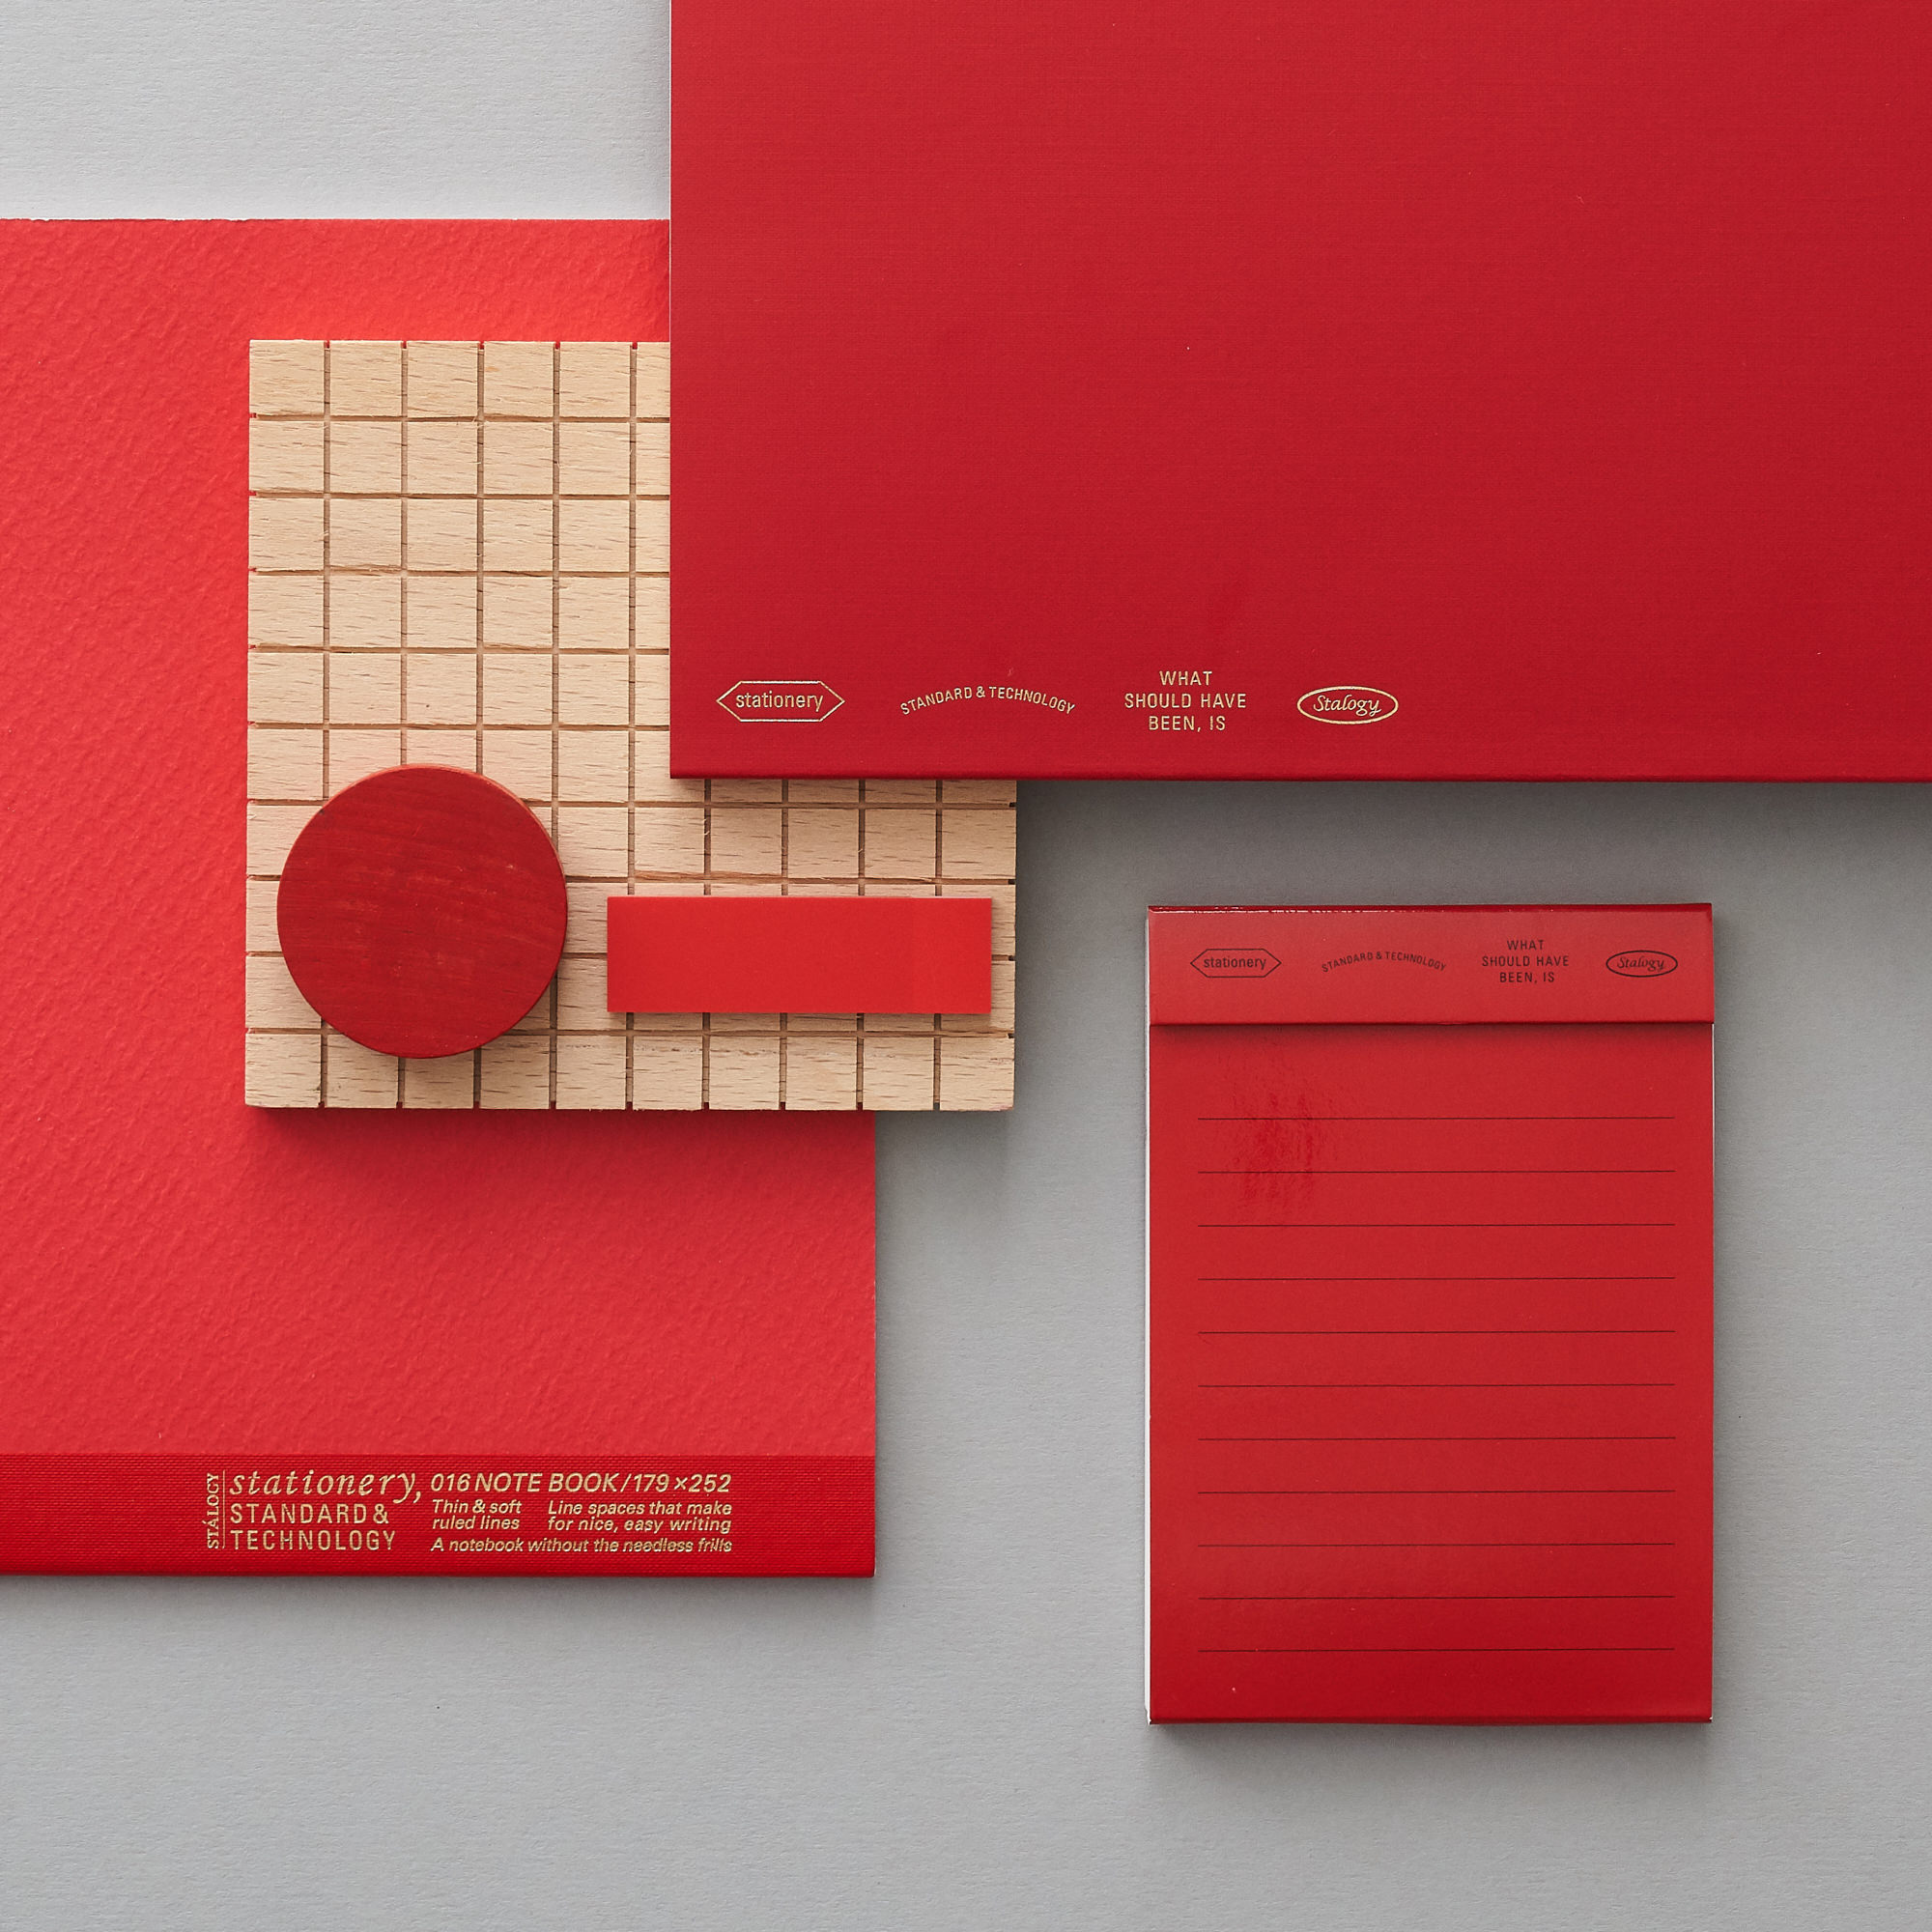 Stalogy Stationery Red layout